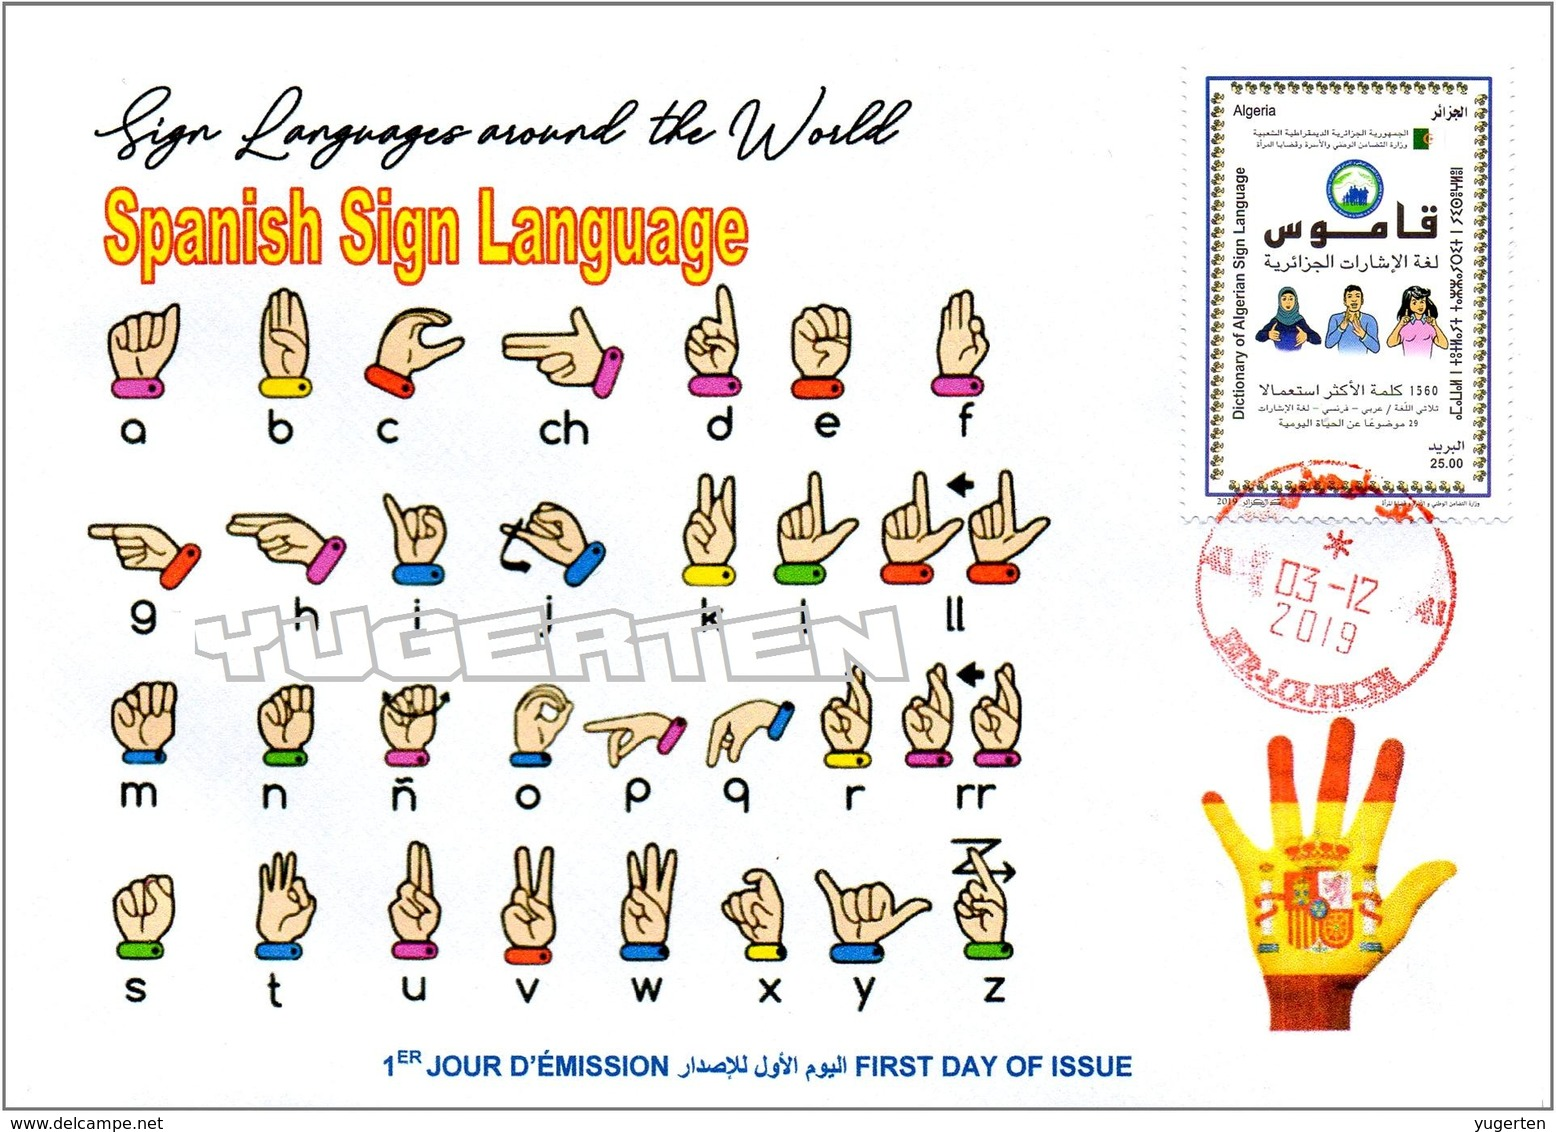 ALGERIA 2019 FDC Sign Language Spain Handicap Deafness Deaf Taubheit Surdité Taub Sordera Alphabet Disabled - Handicaps